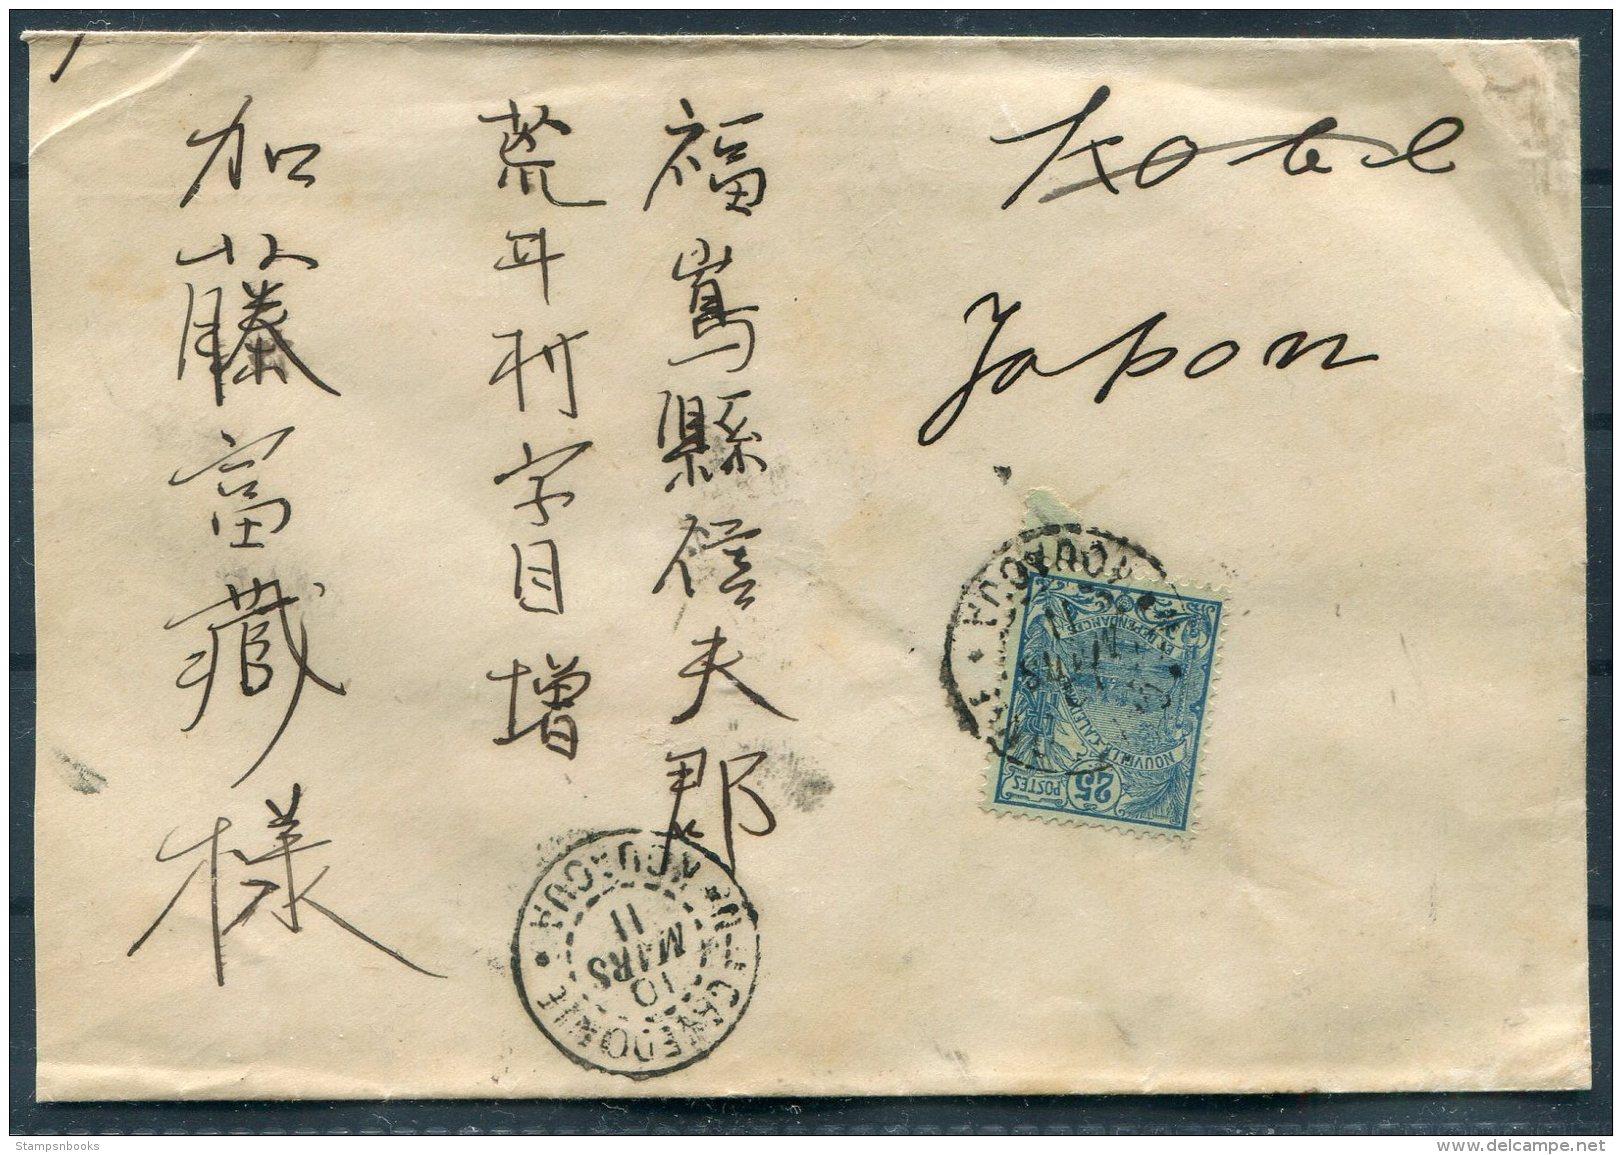 1911-13 New Caledonia 3 Covers - Kobe Japan. Japanese Worker In Nickel Mines Pouembout, Kouaoua, Noumea - Briefe U. Dokumente